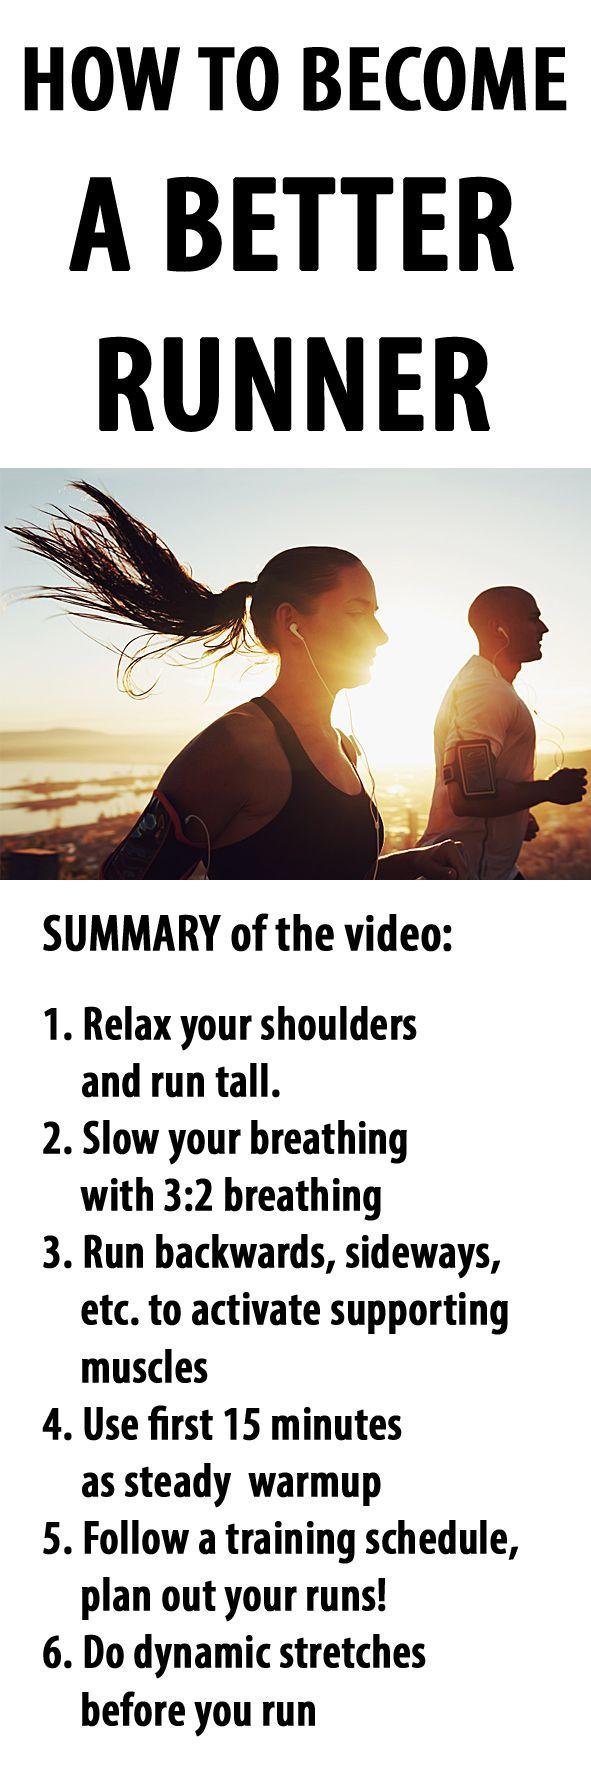 .This is how you can become a BETTER RUNNER…  #running #runningtips #runningadvice